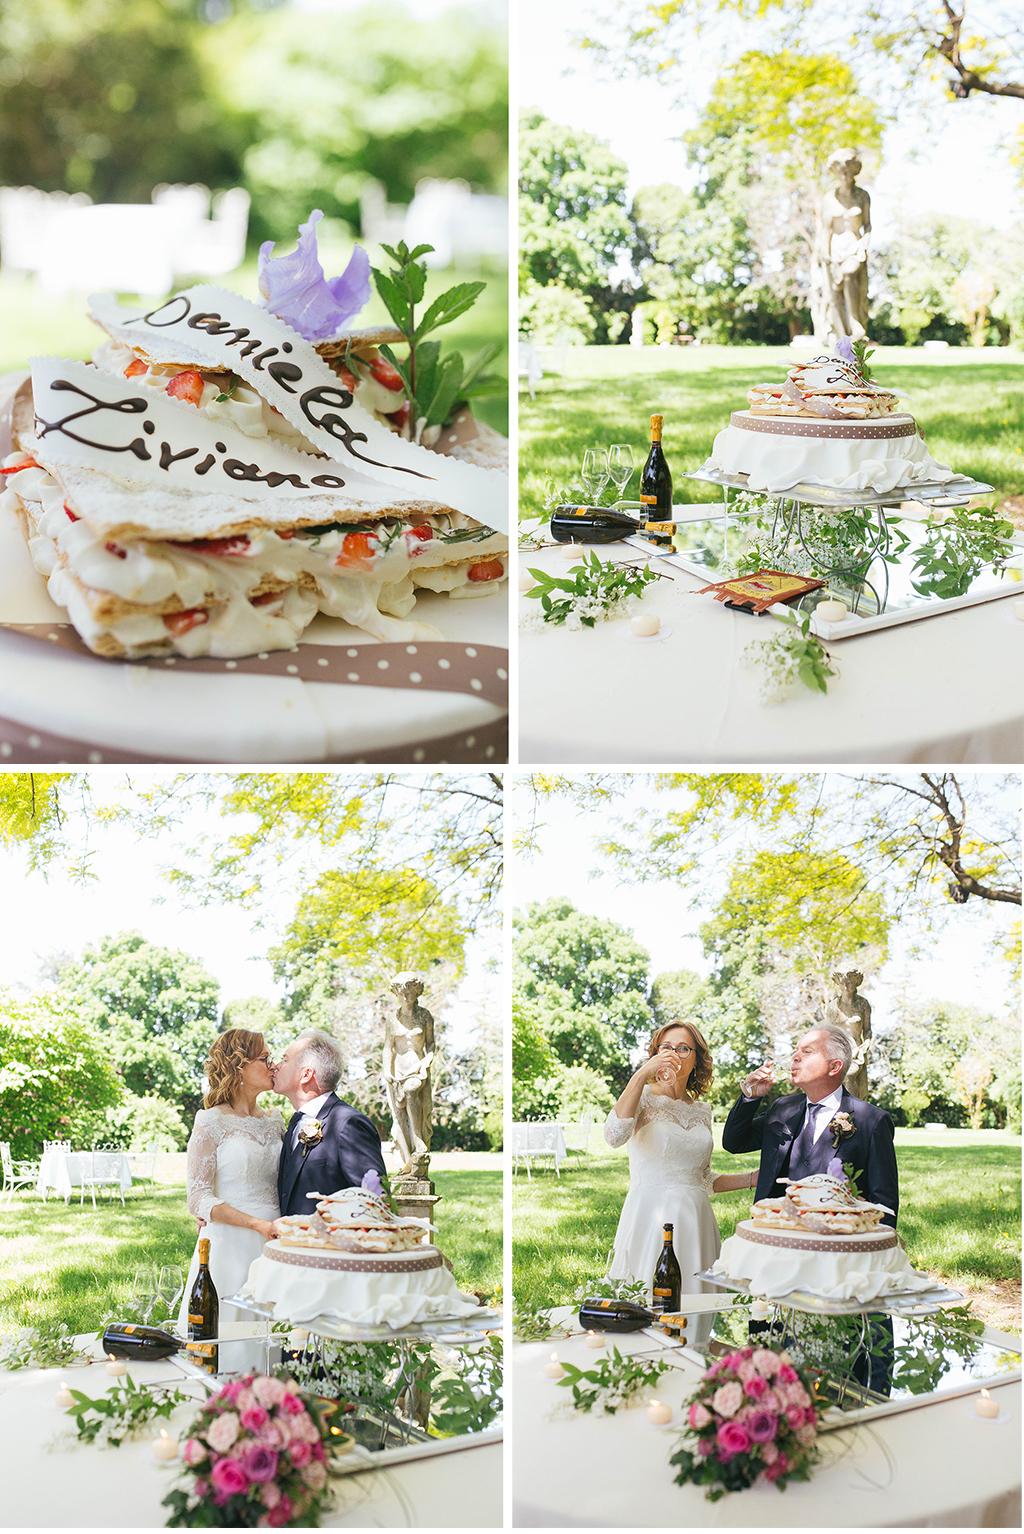 matrimonio gambrinus san polo di Piave 2021 daniela e liviano Deborah Brugnera fotografa treviso Venezia